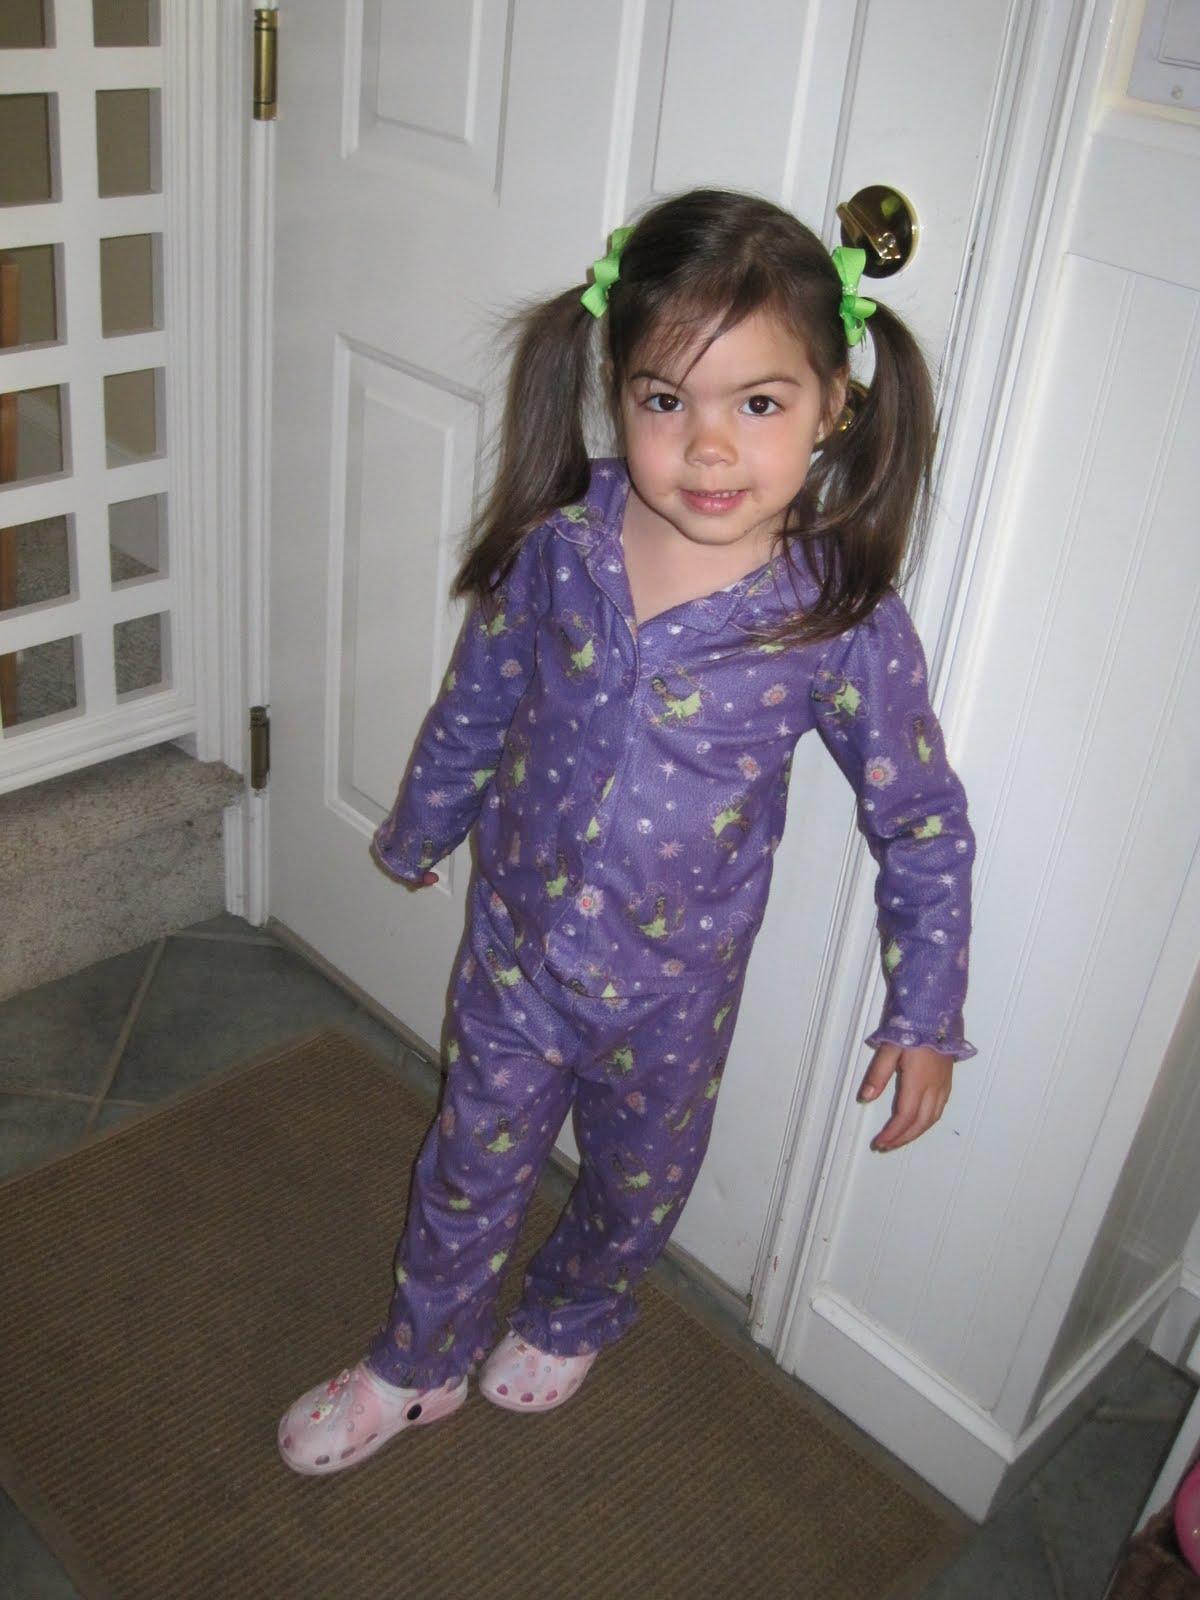 Kout Kids In Hampton Pajama Day At School 04 22 10